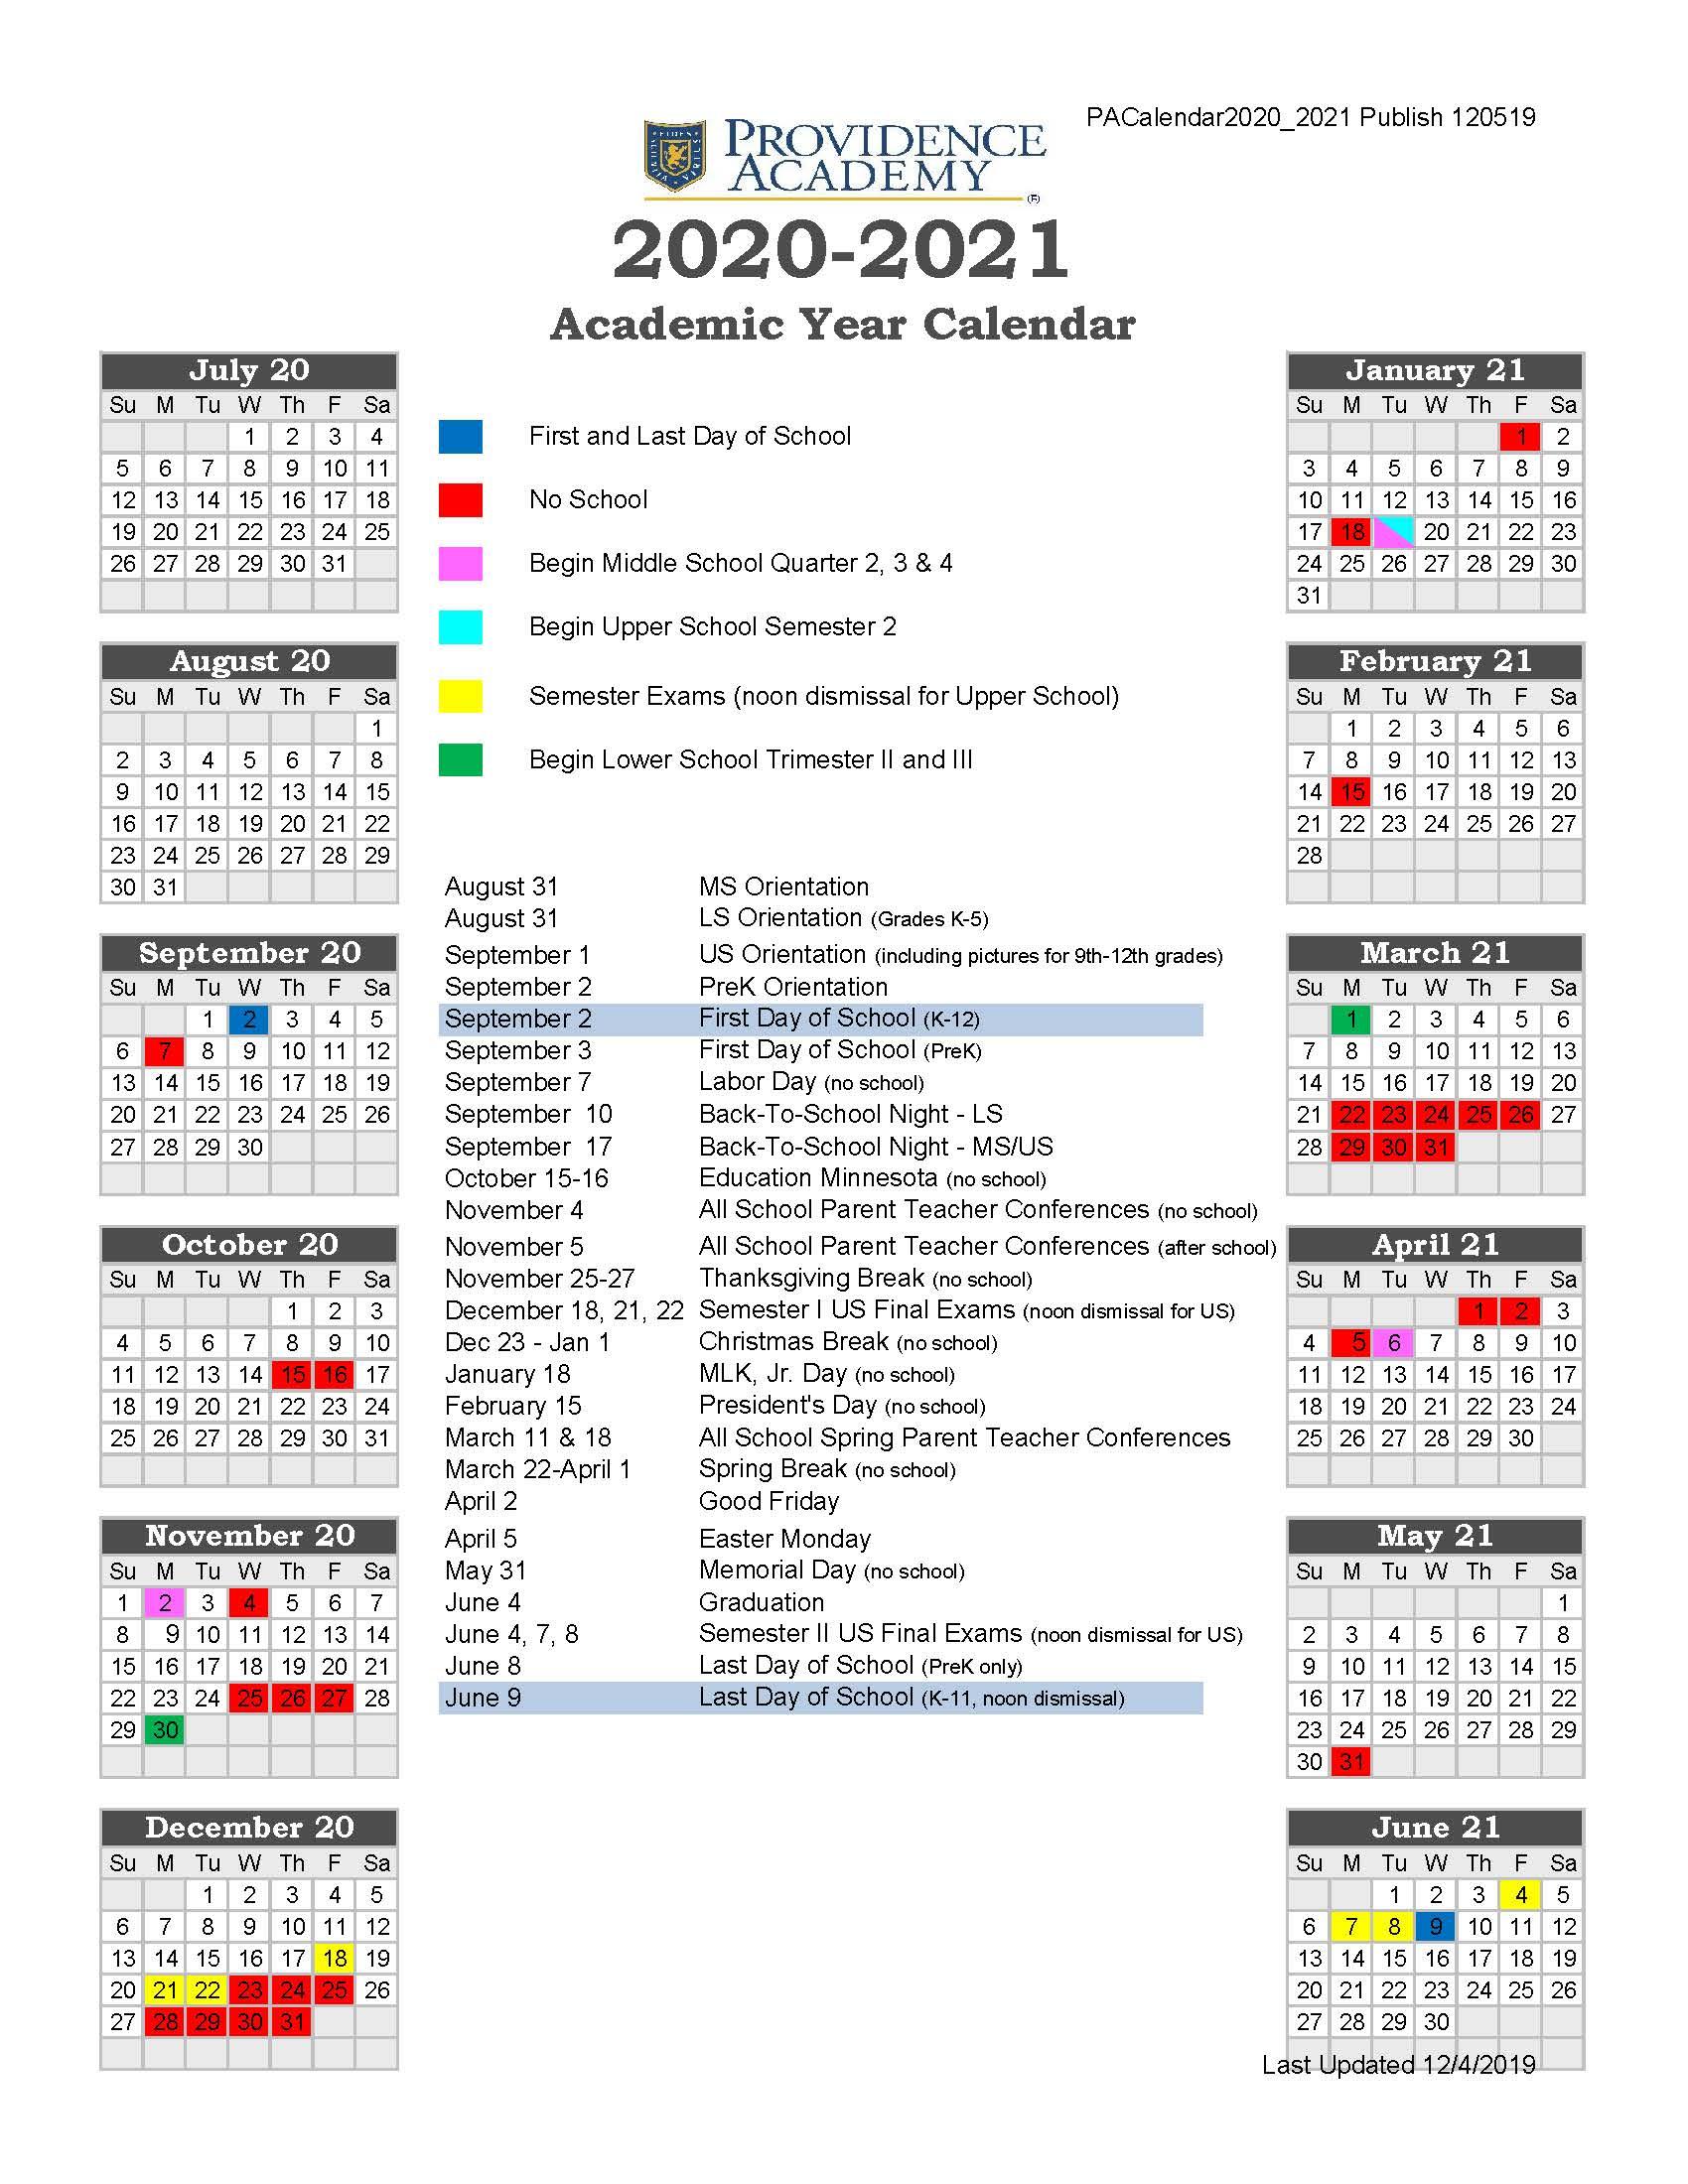 19 20 Providence Academy Academic Calendar 2020 2021 For White Bear Lake Calendar Handbook 2021 2021